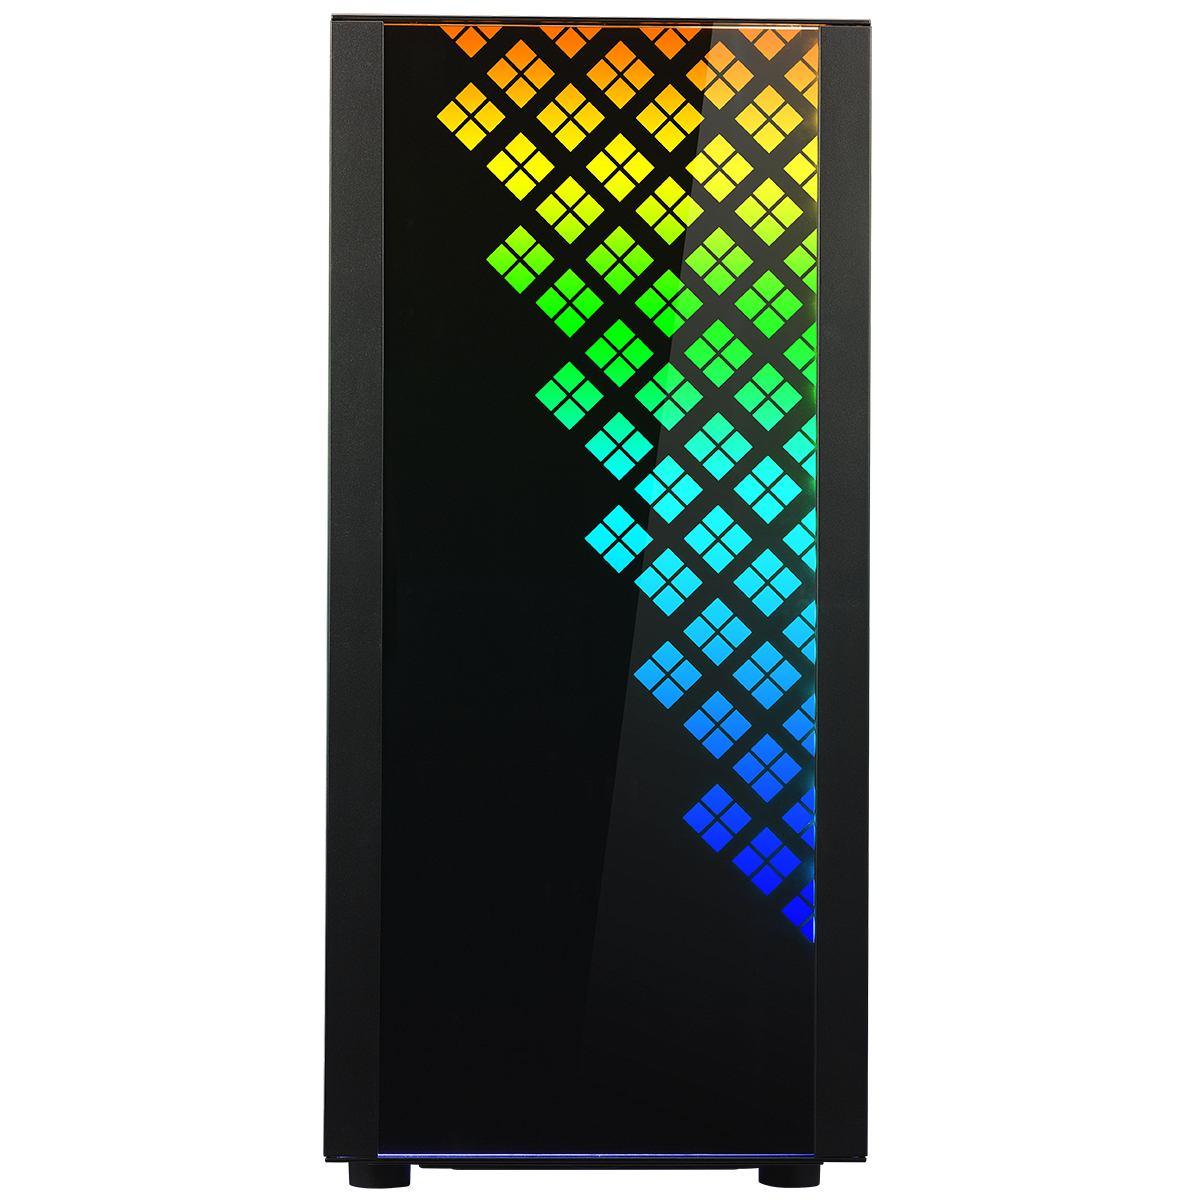 2022026-Bitfenix-Dawn-TG-ARGB-Midi-Tower-Case-Black